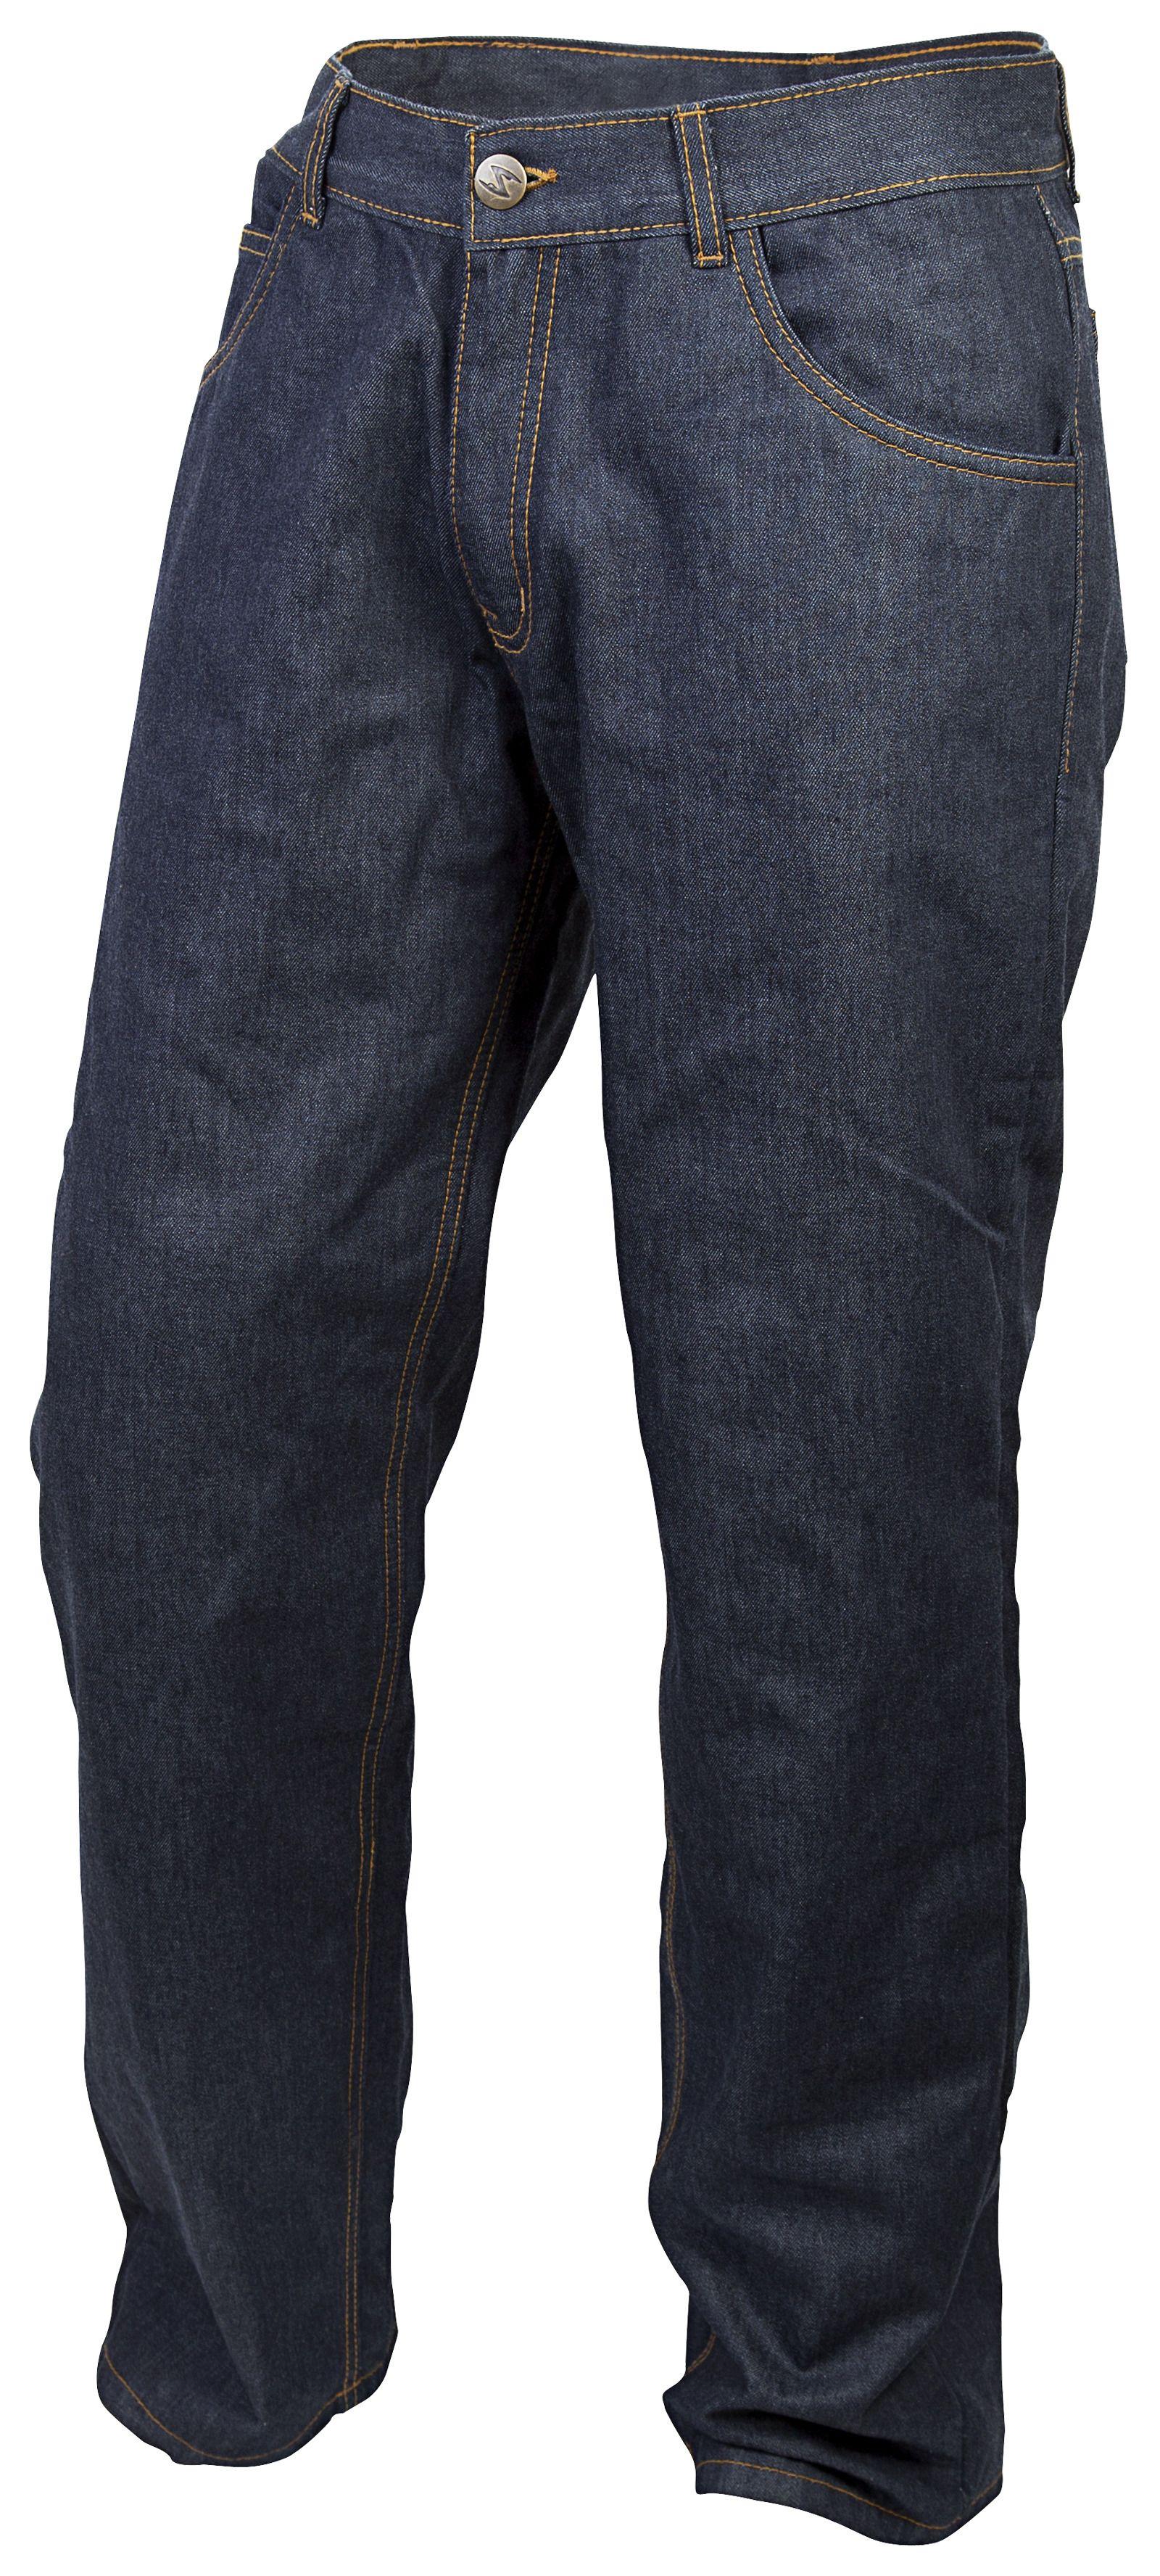 Scorpion Covert Pro Jeans